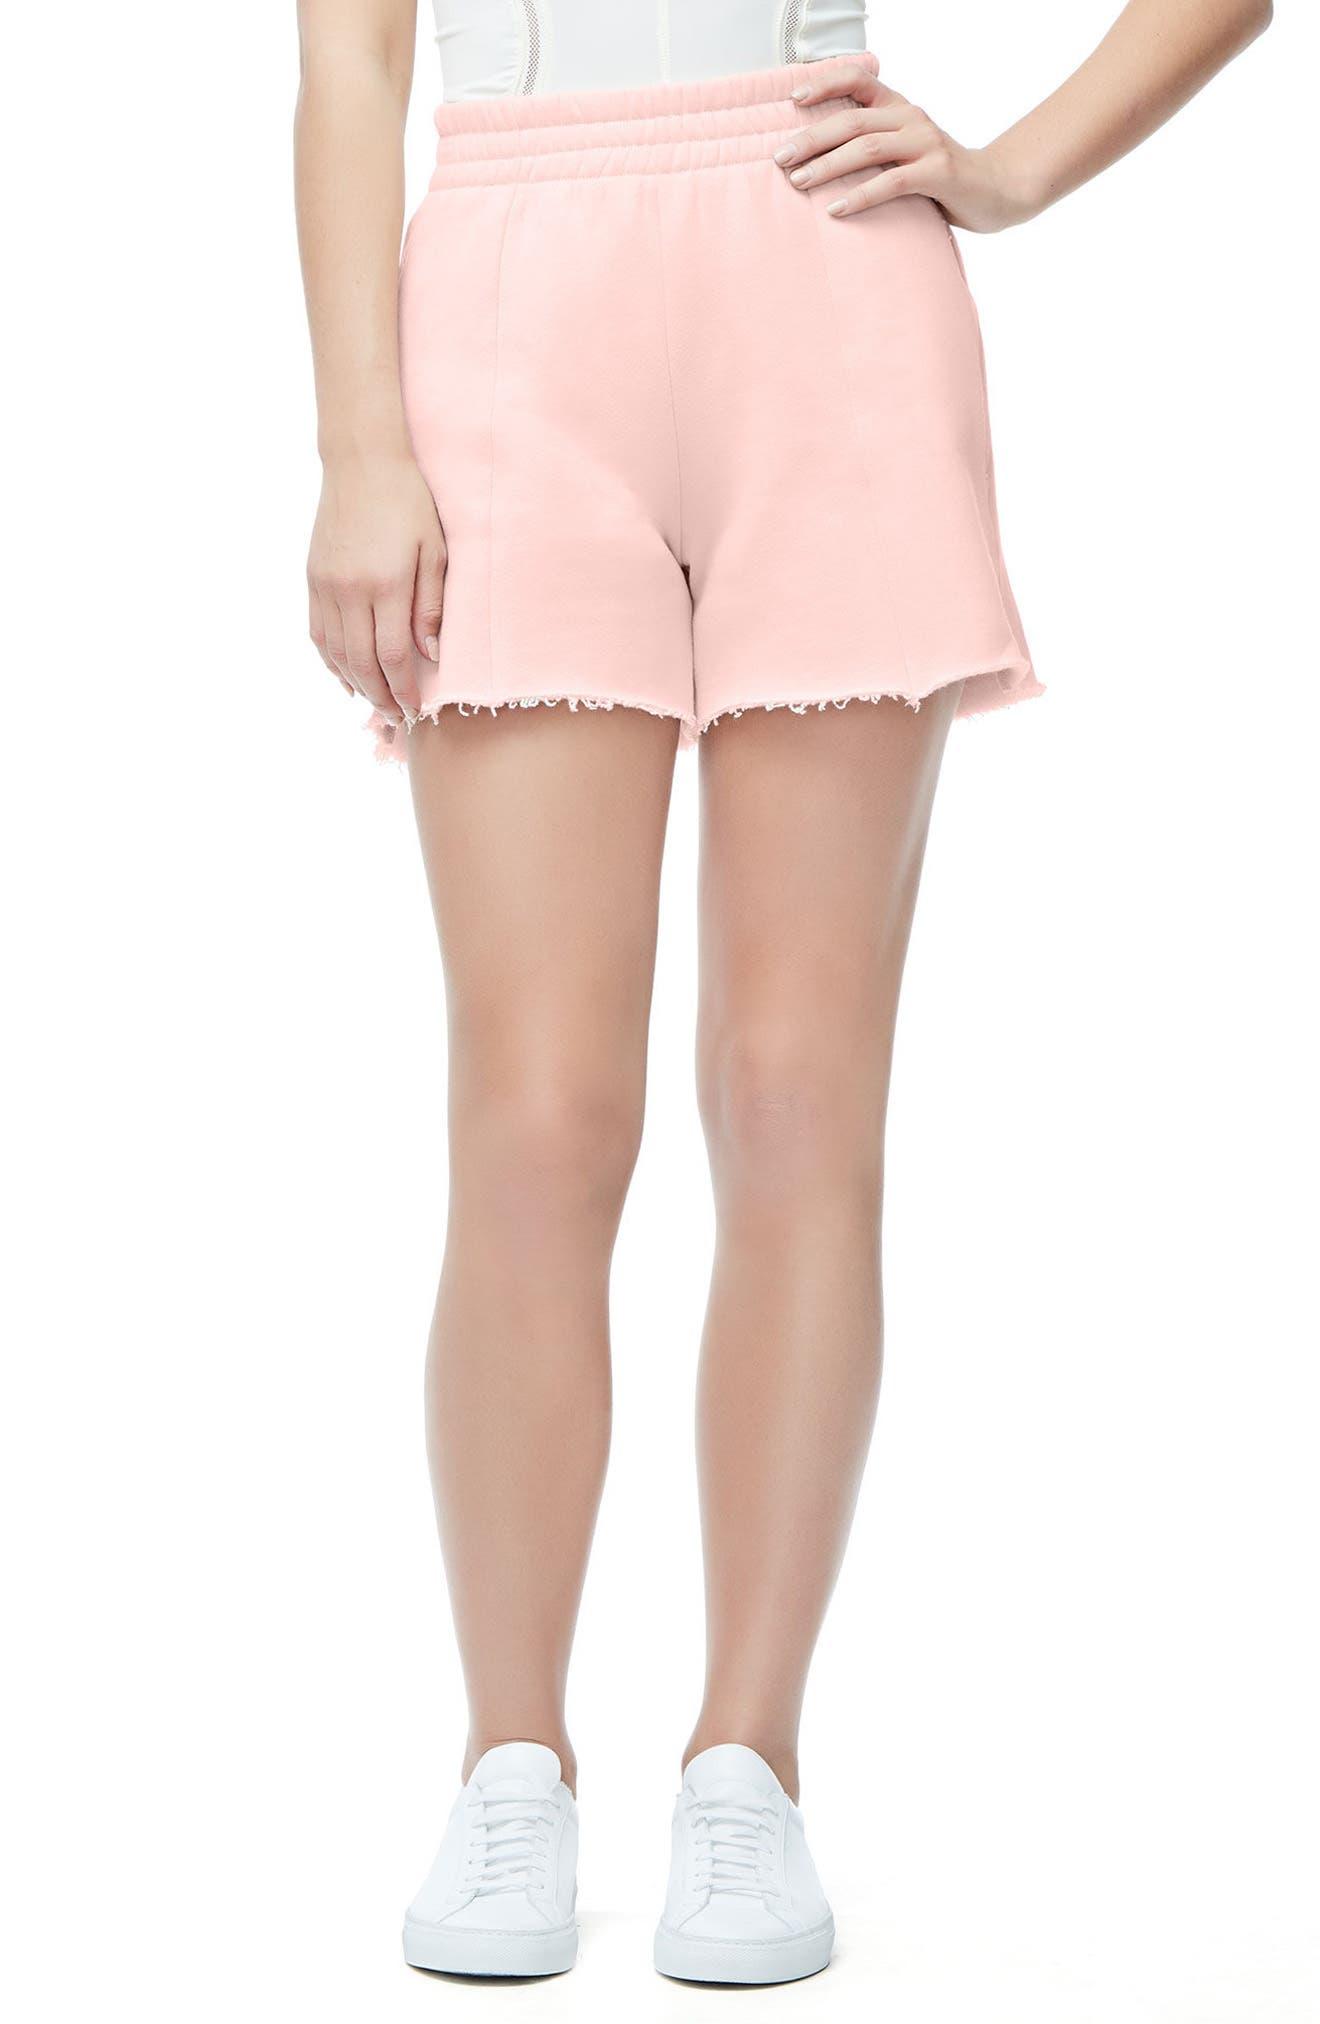 Alternate Image 1 Selected - Good American Wide Leg Sweat Shorts (Regular & Plus Size)